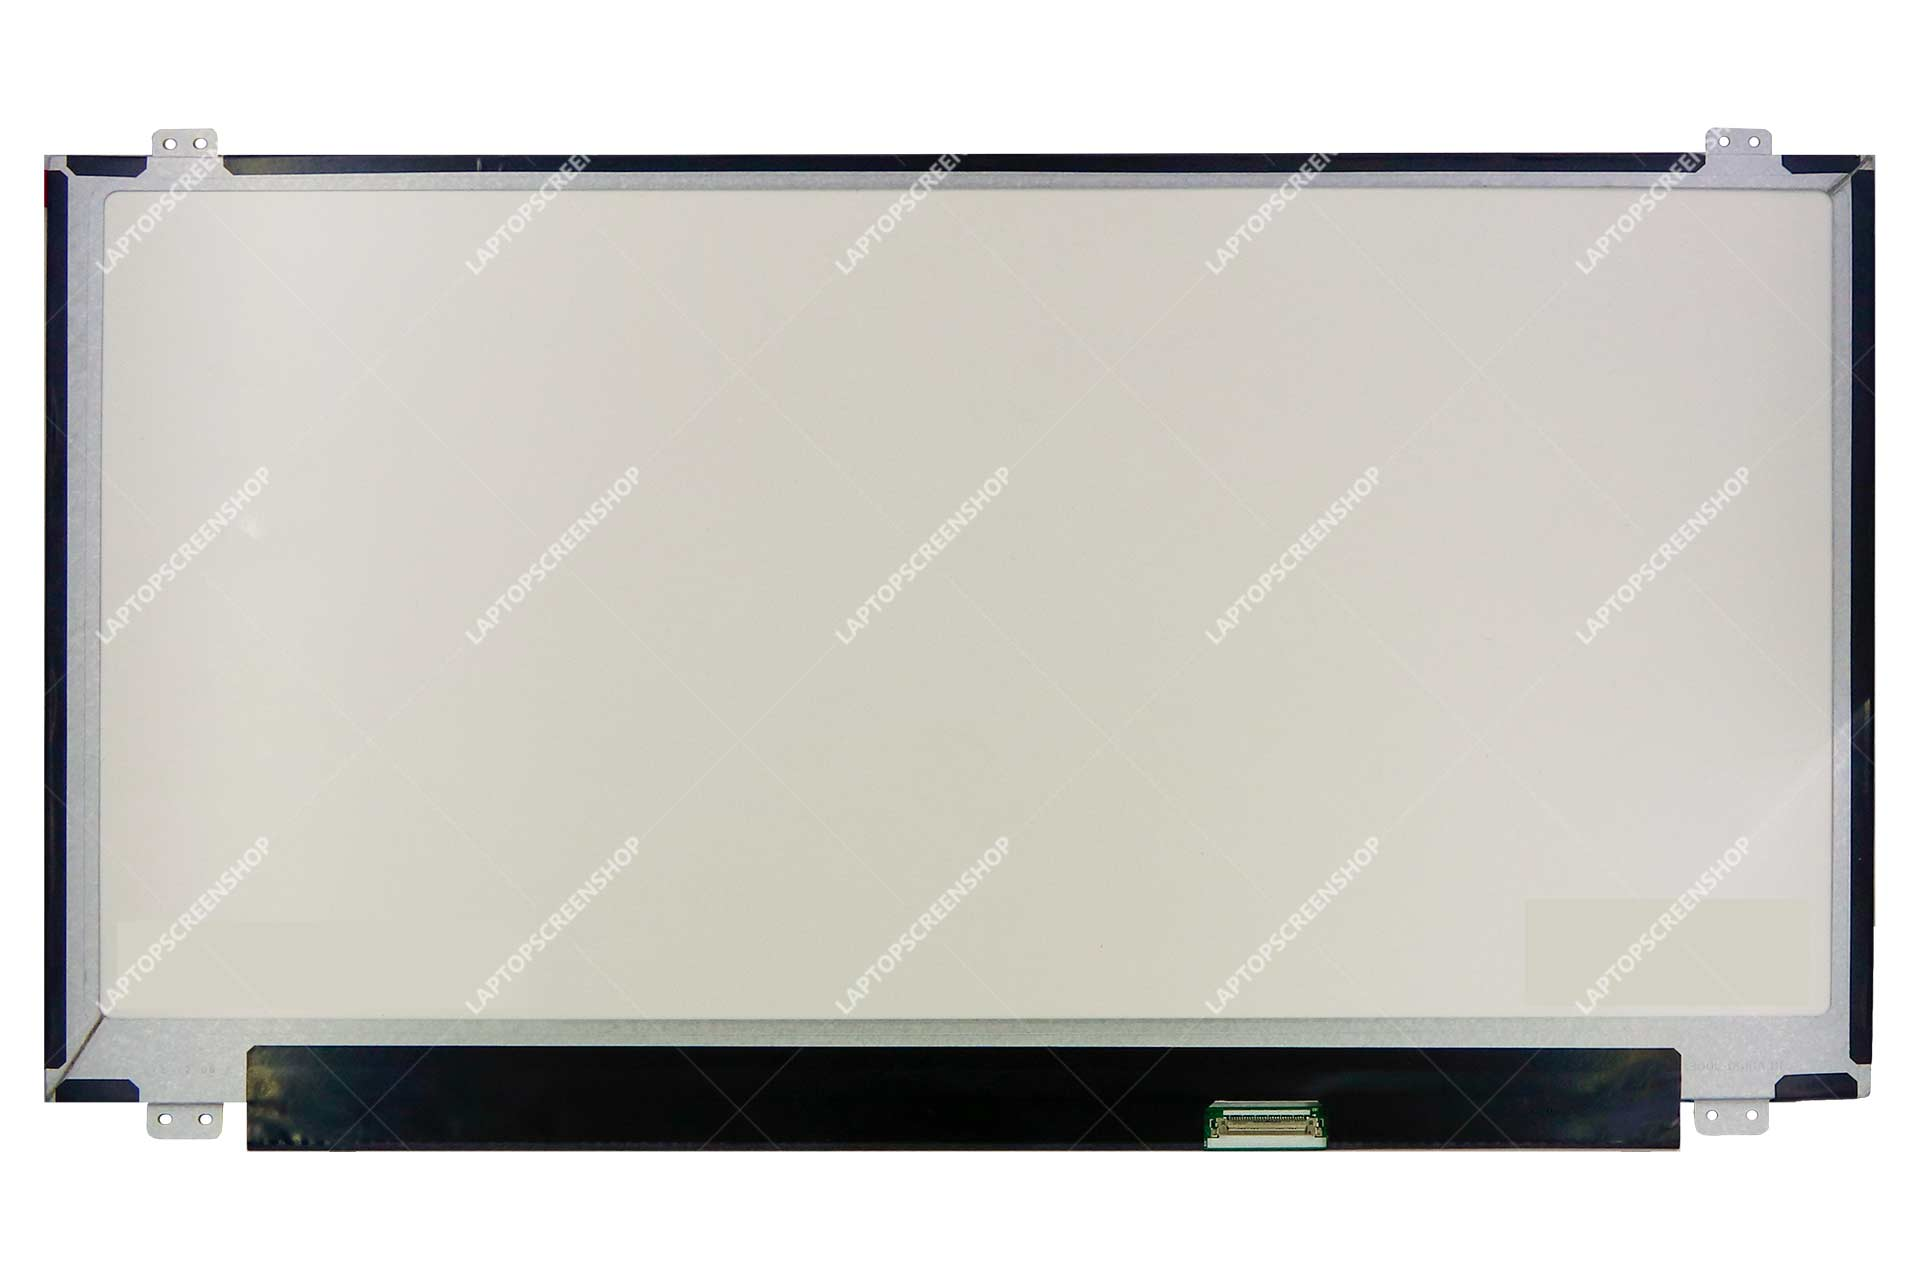 ACER-ASPIRE-E1-570-F34D-LCD |HD|فروشگاه لپ تاپ اسکرين | تعمير لپ تاپ